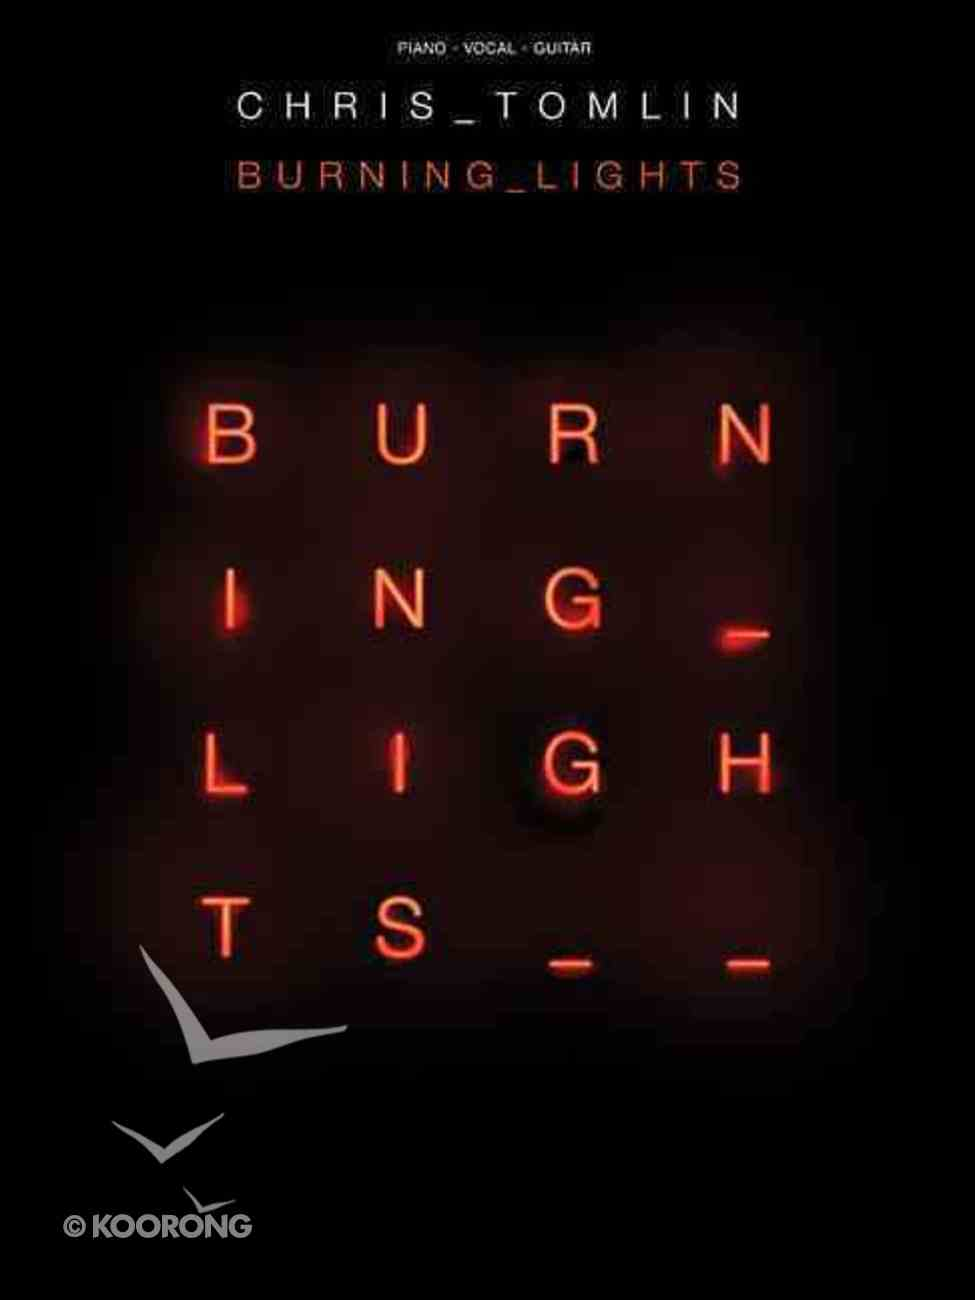 Chris Tomlin - Burning Lights (Music Book) Paperback